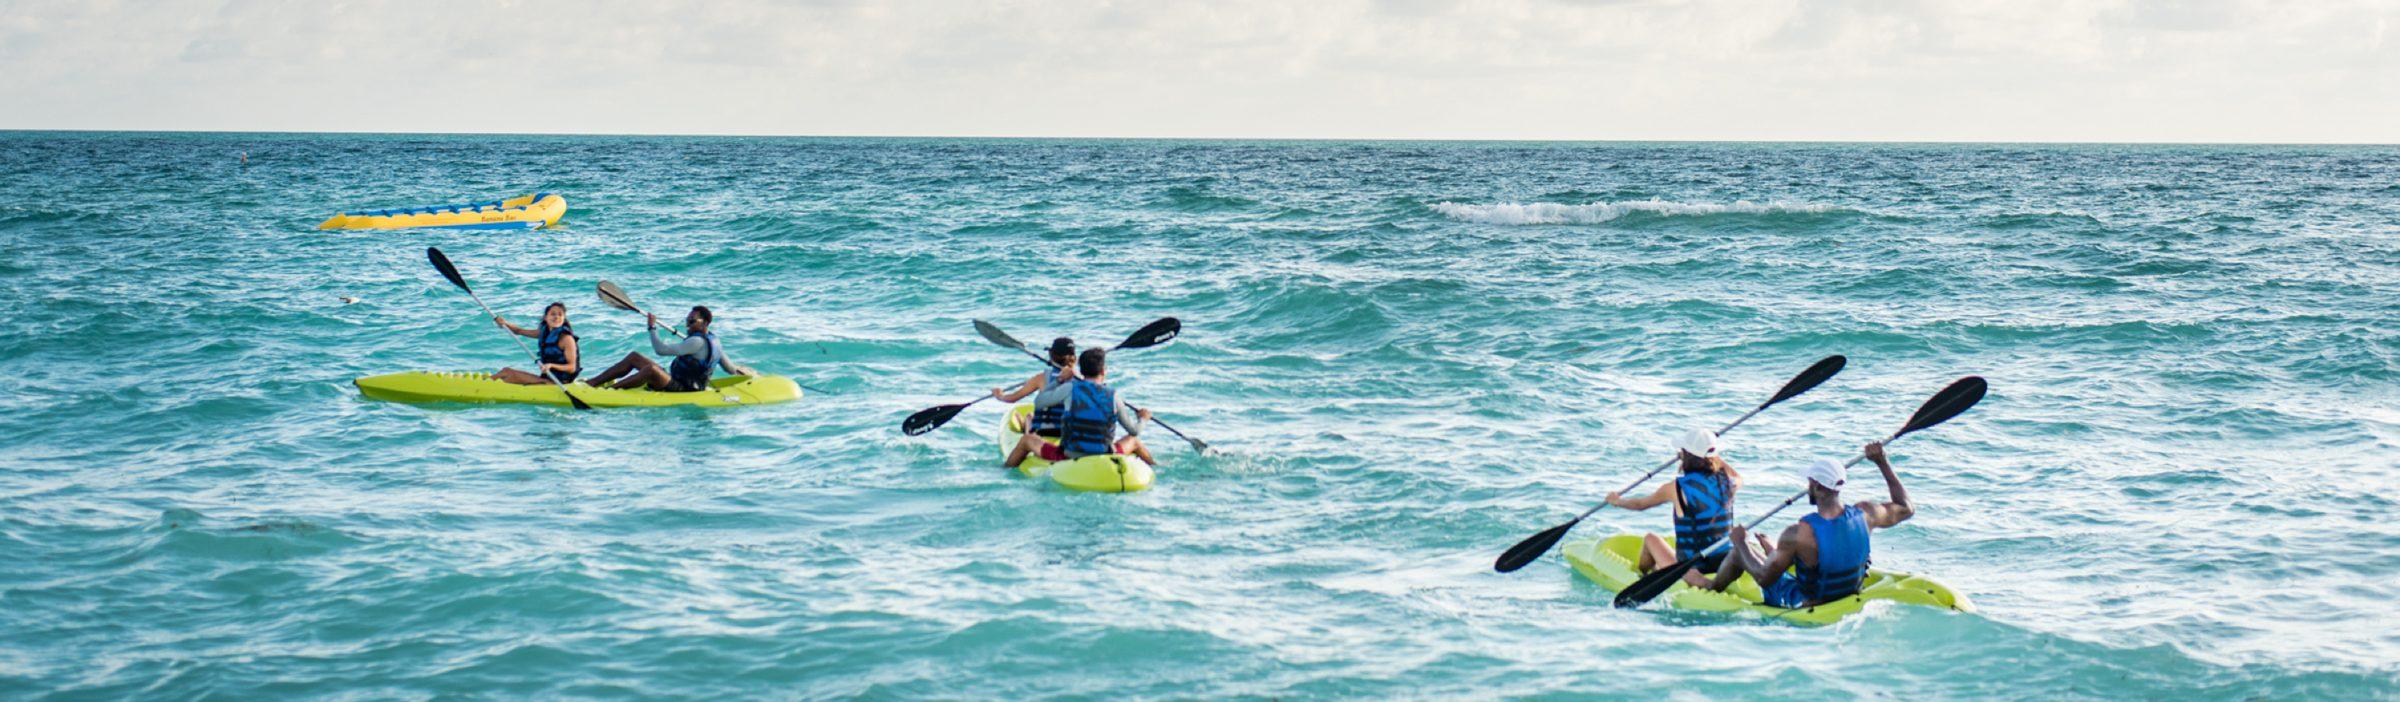 BouYah Watersports - Hilton Clearwater image 3